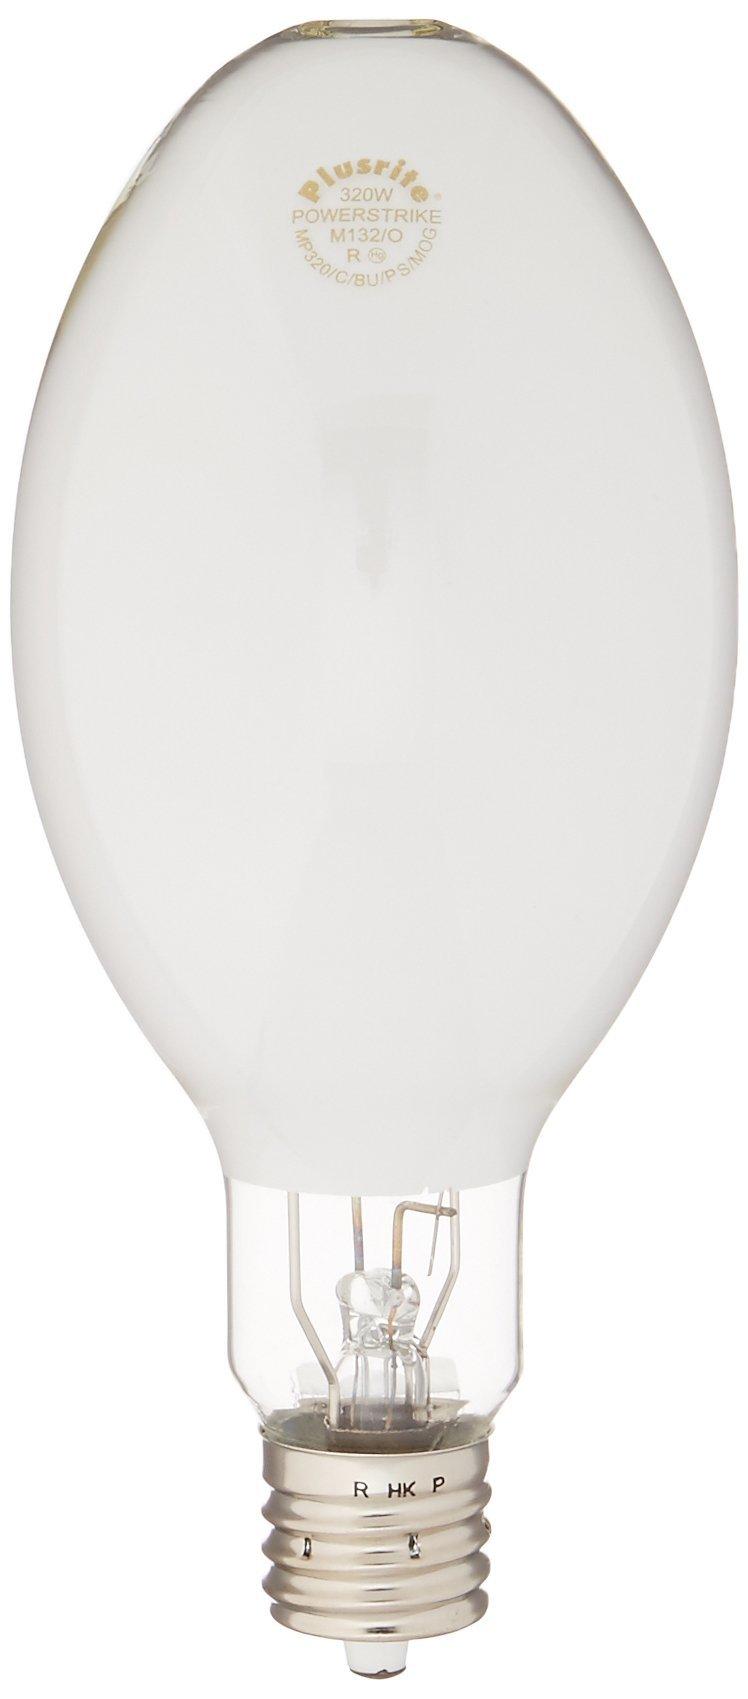 Plusrite 1616 MP320/ED37/C/PS/BU/4K 320W Metal Halide Light Bulb